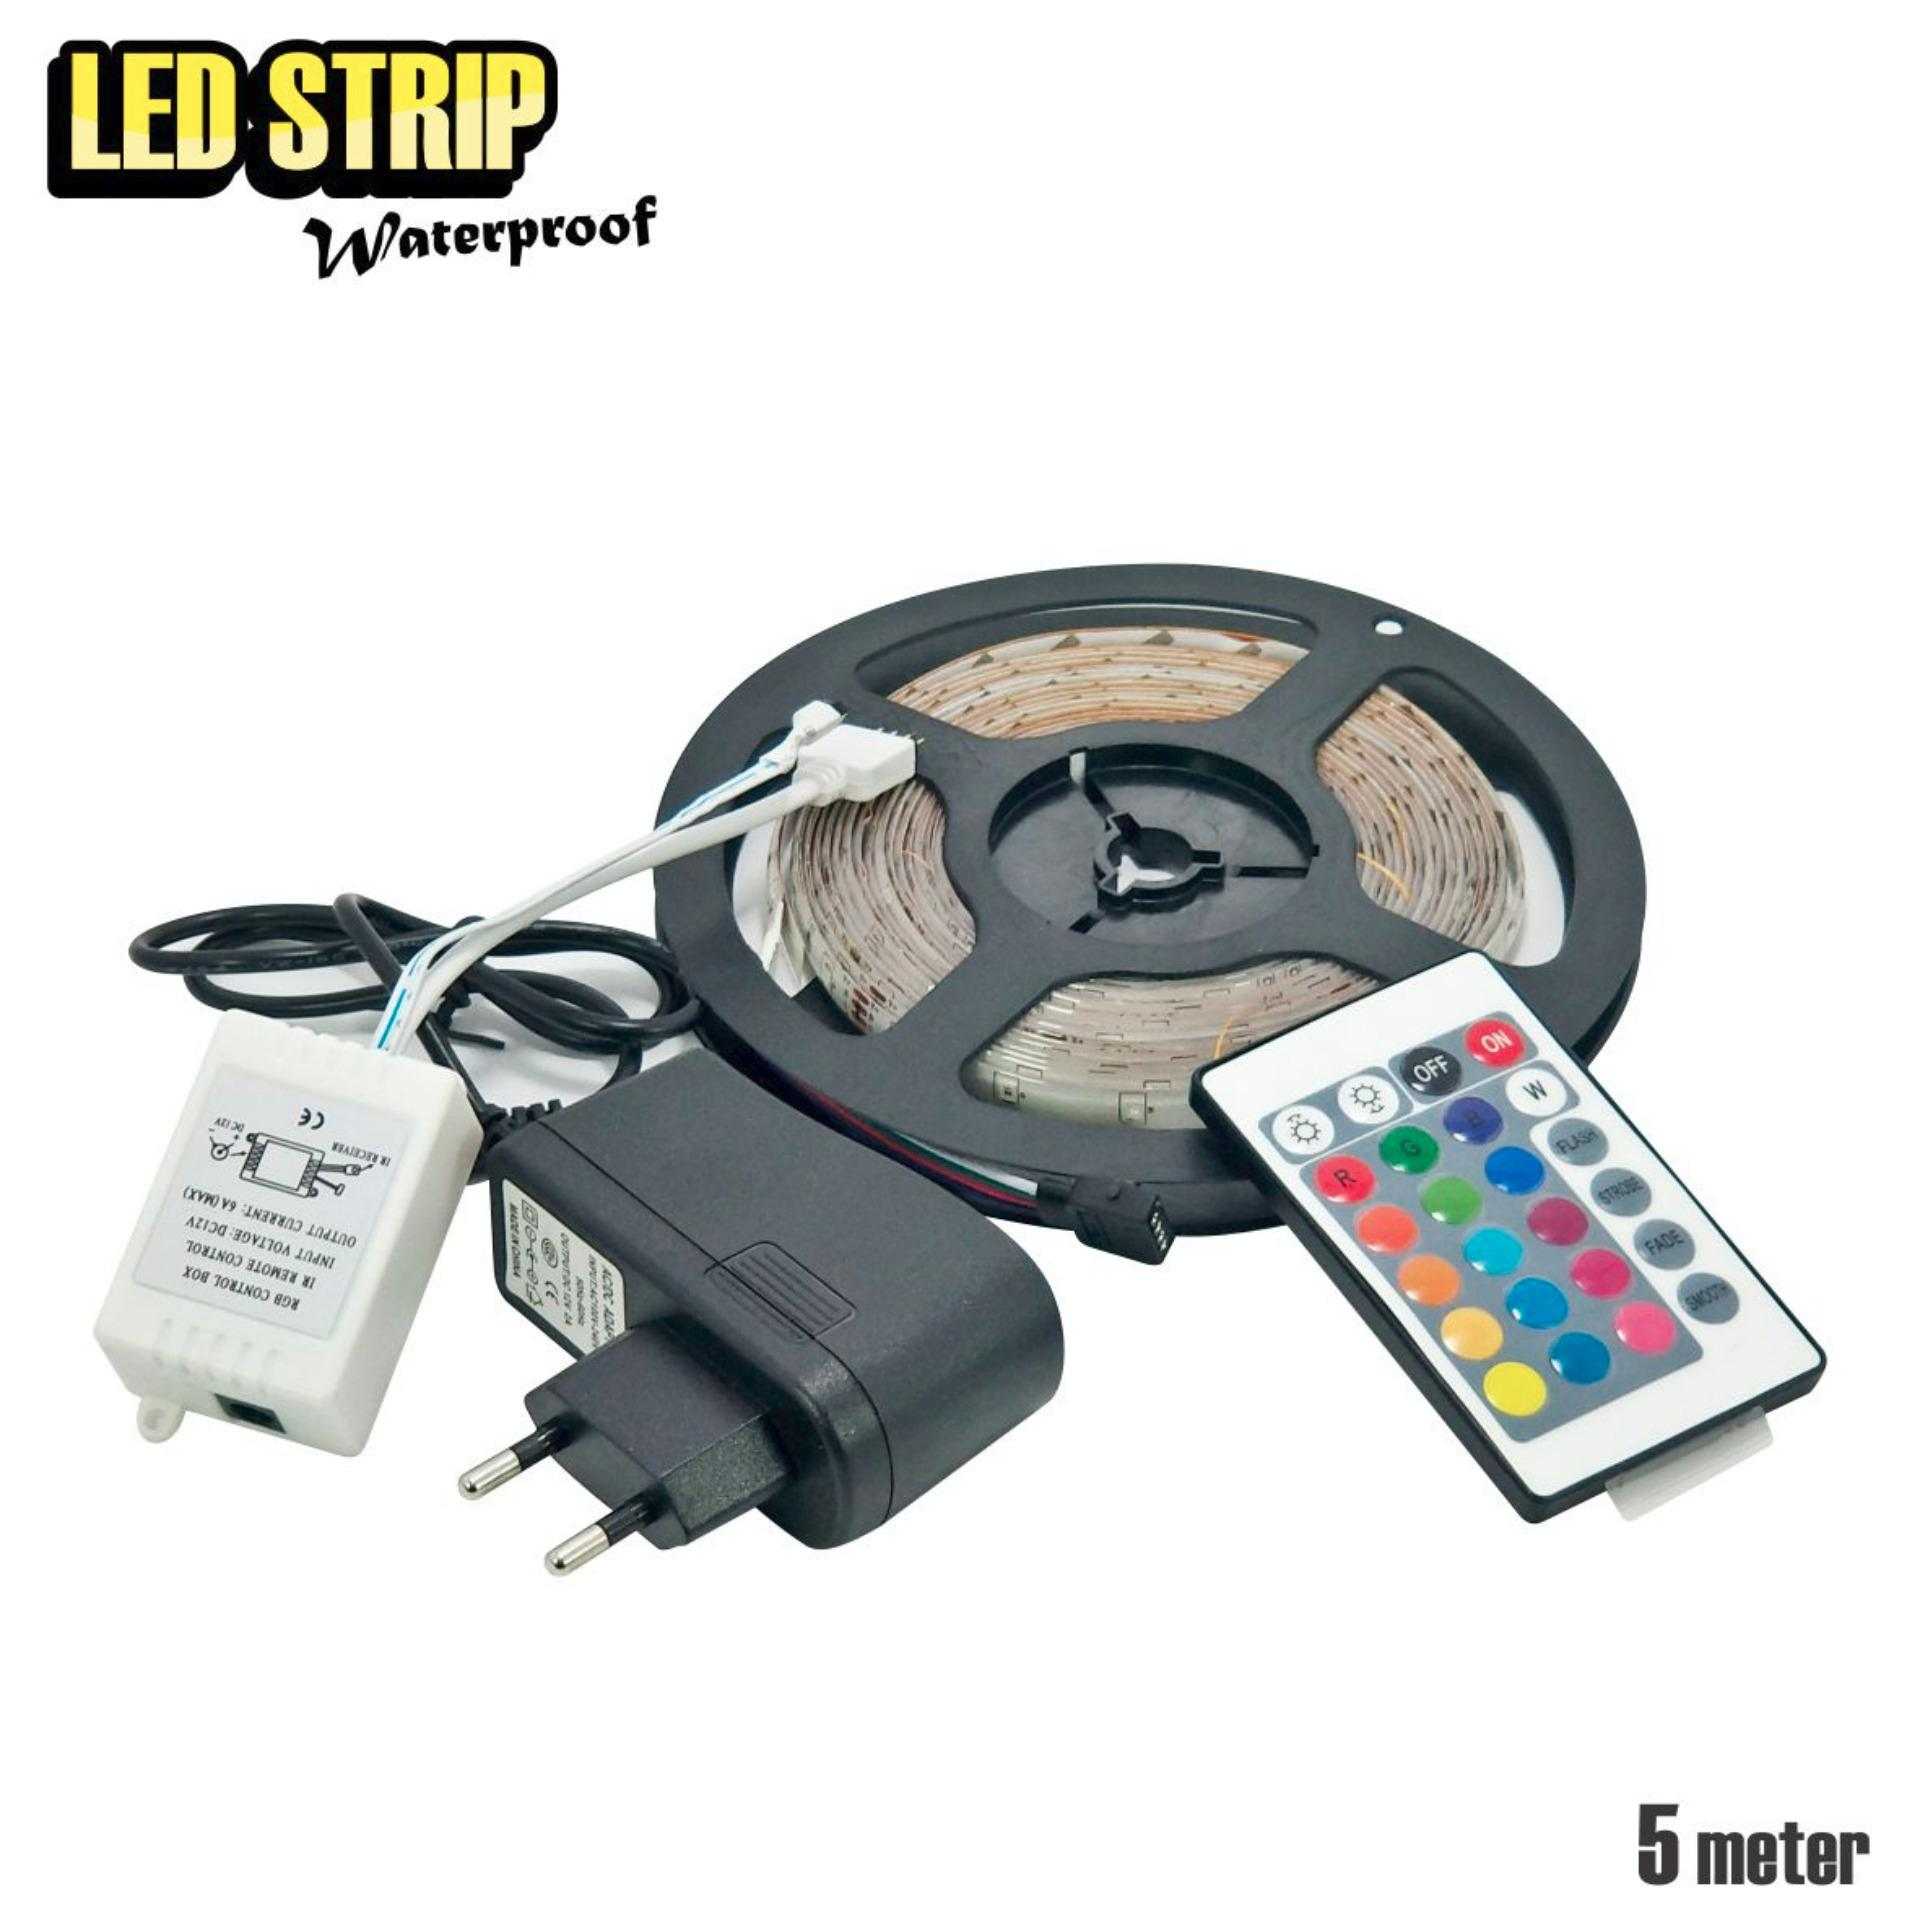 WEITECH Lampu Led strip WARNA WARNI 5M+ADAPTOR+REMOTE 3528